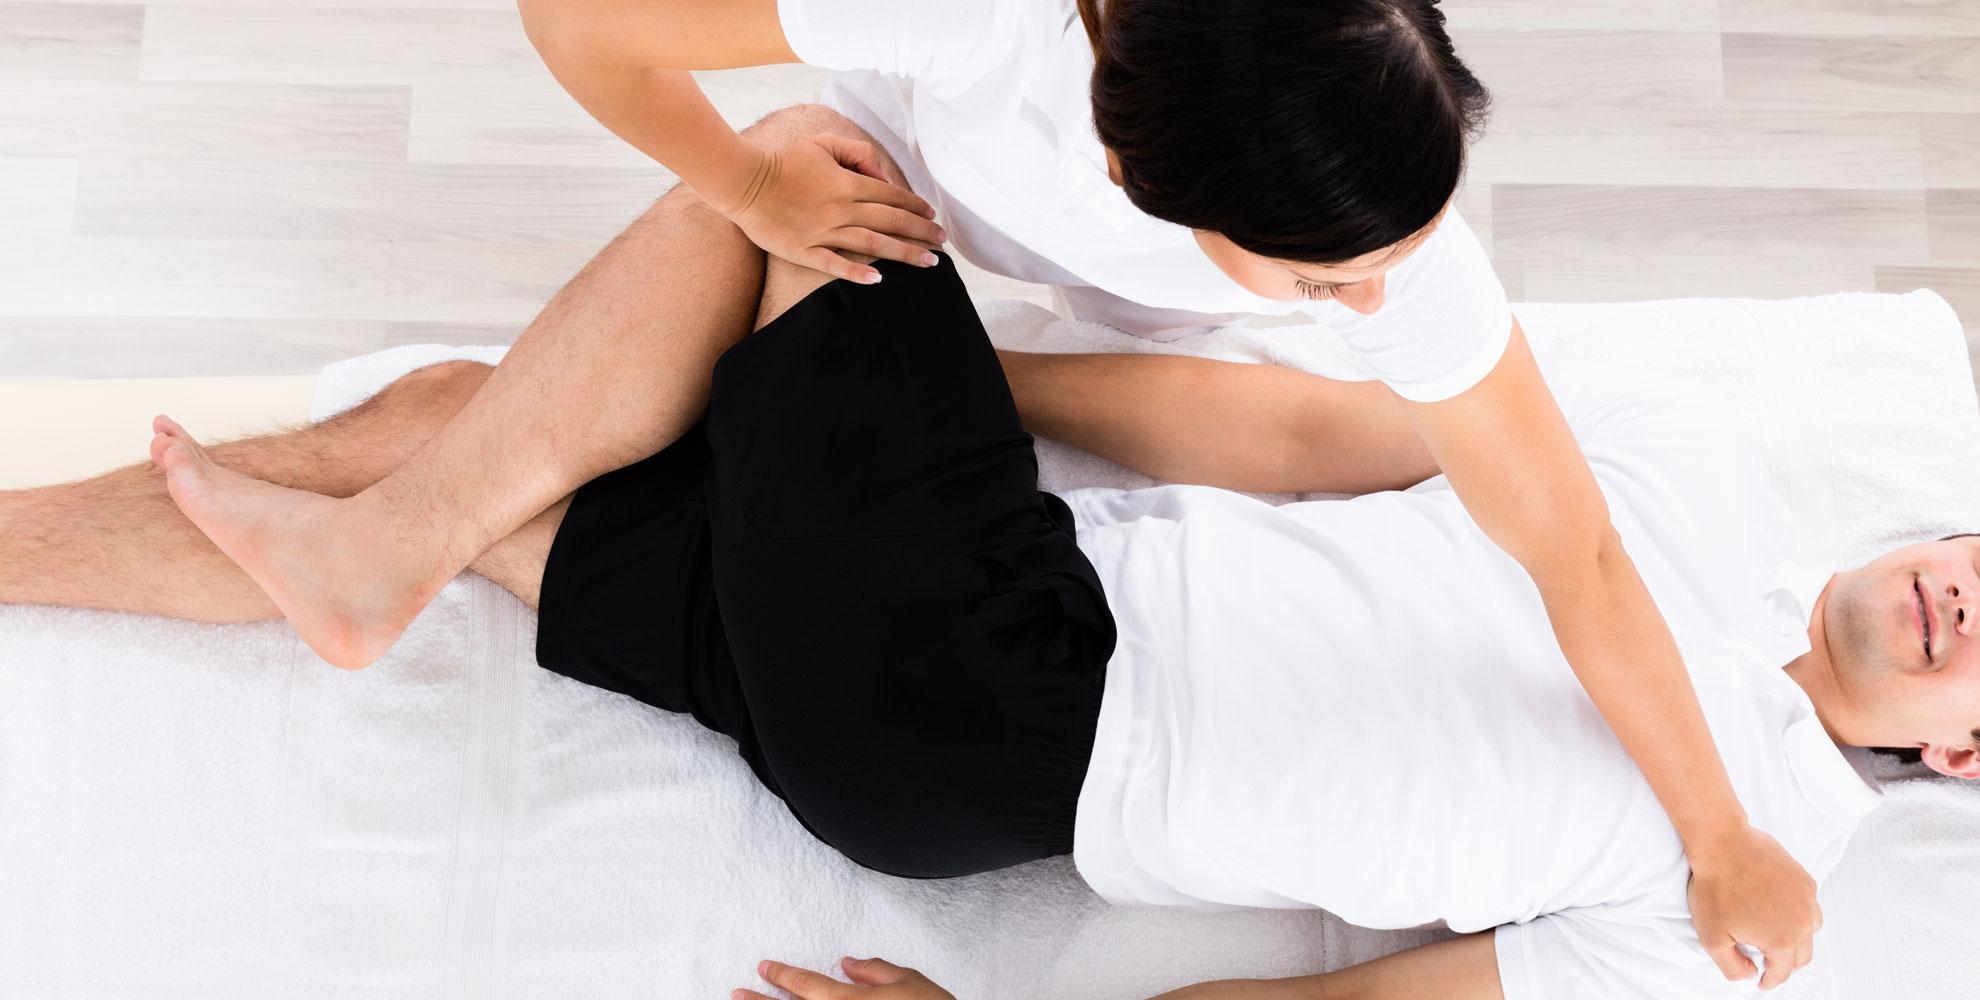 Helps Chronic Back Pain